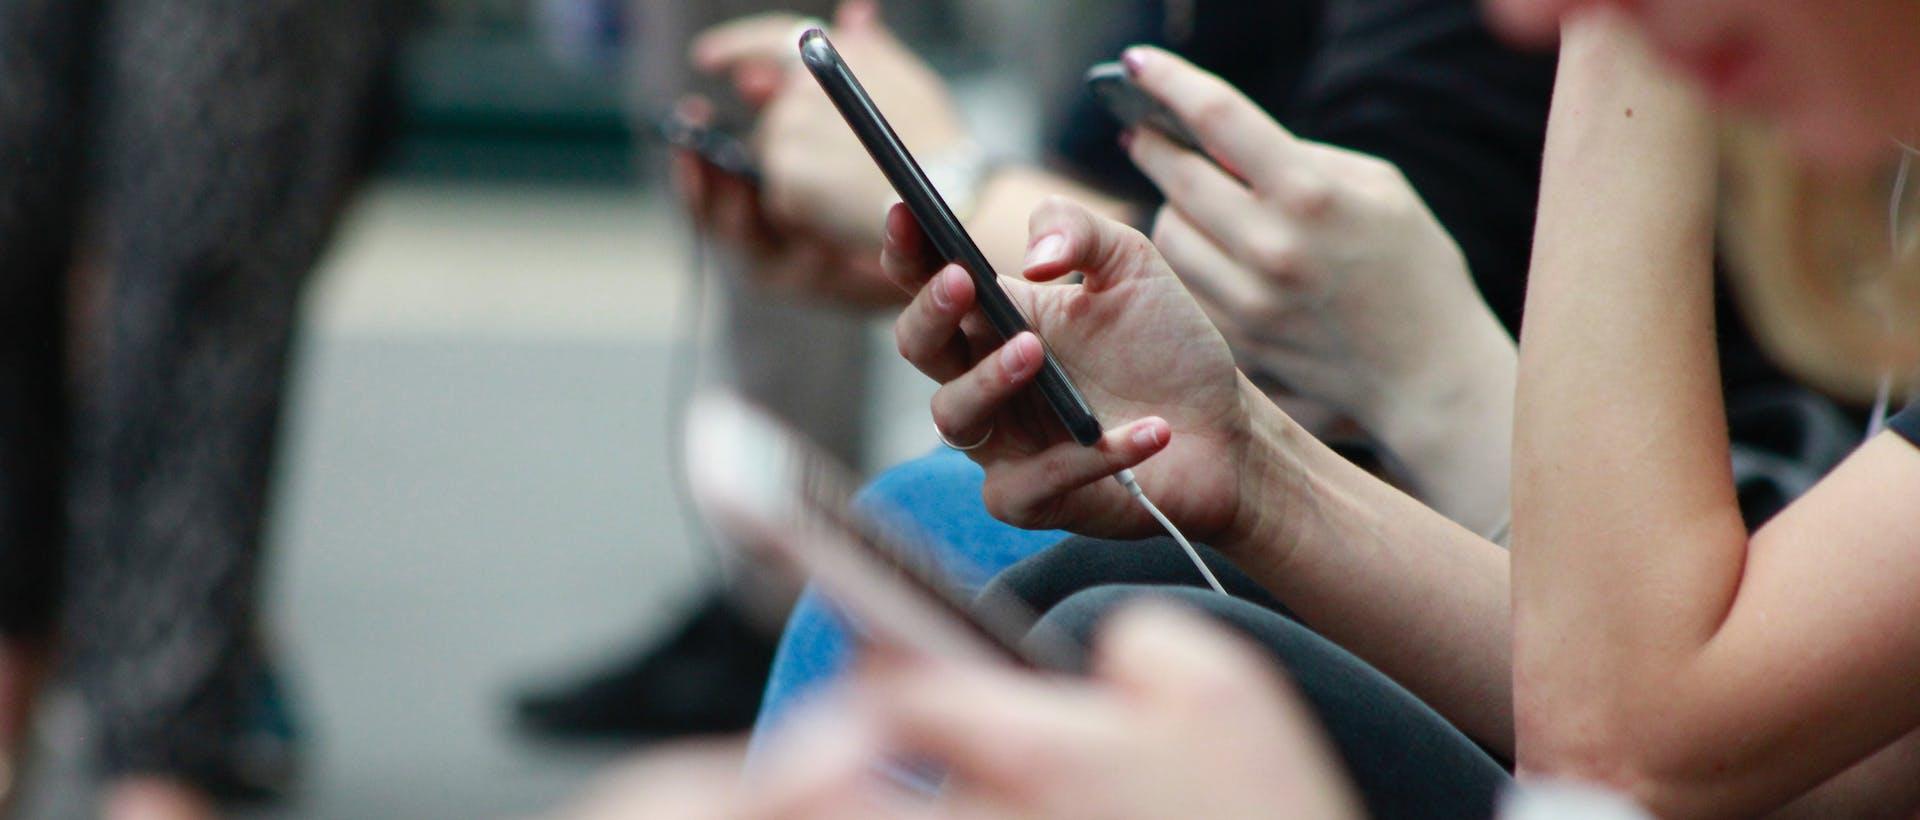 social sharing on mobile phone